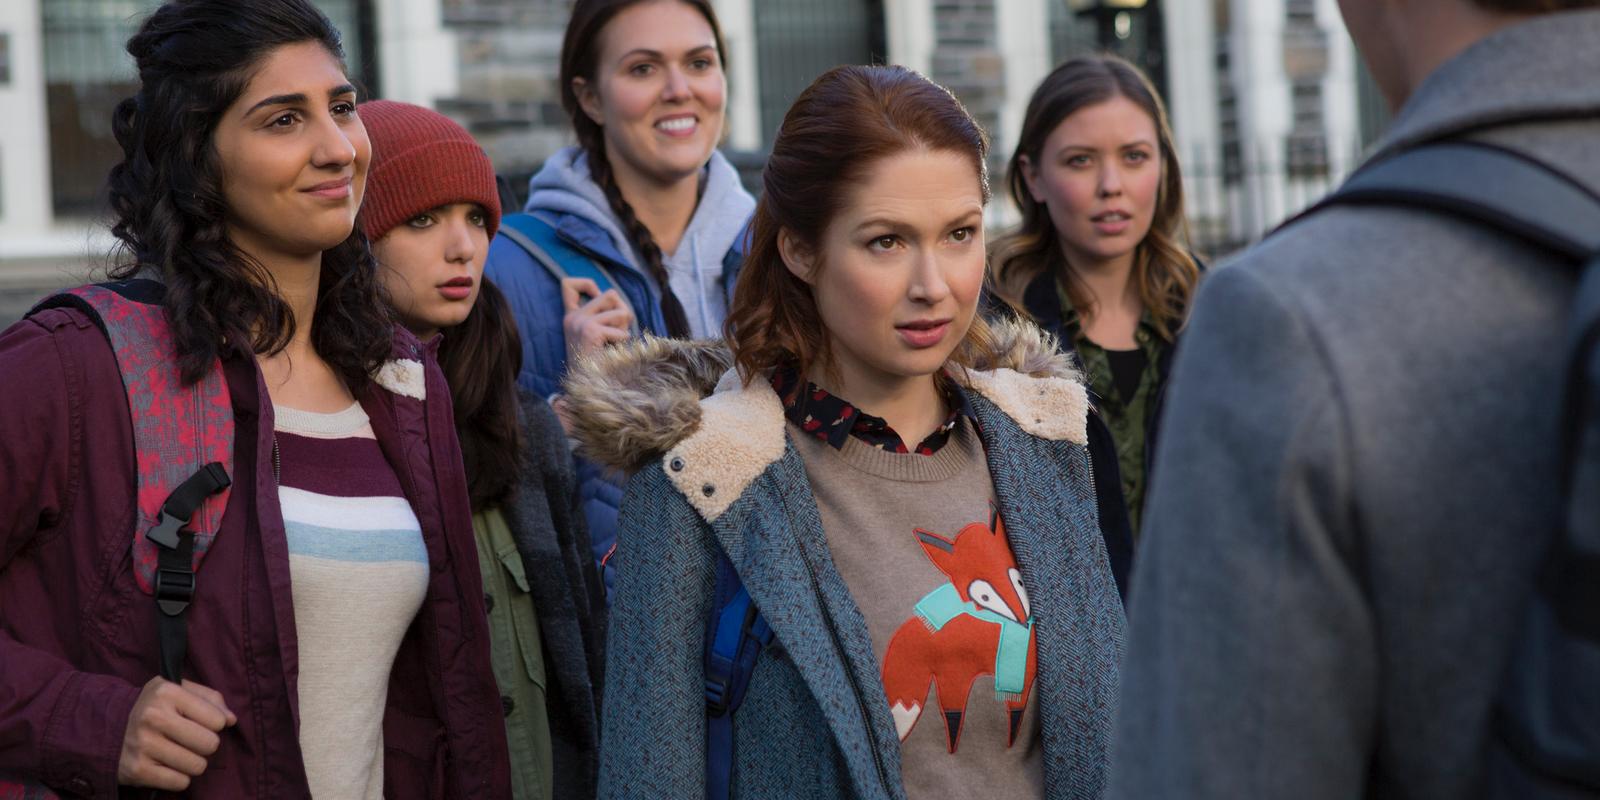 Ellie Kemper in Unbreakable Kimmy Schmidt Season 3